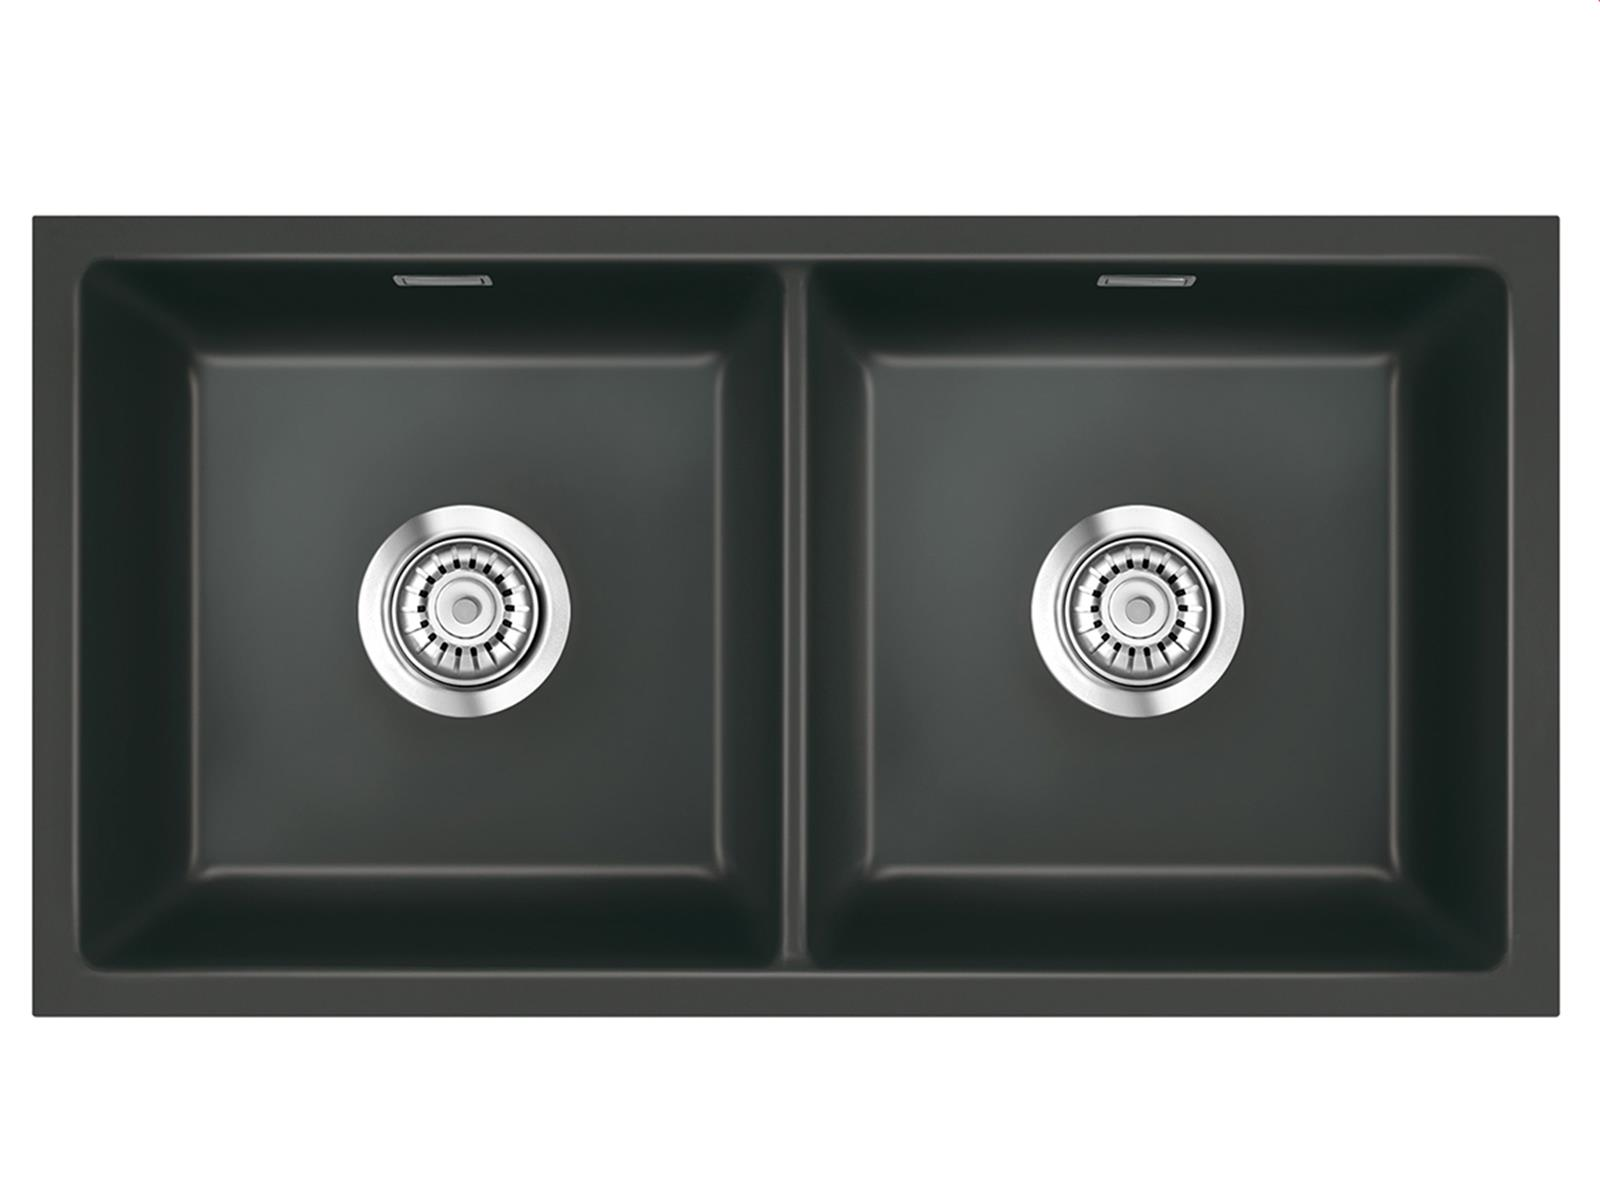 Systemceram Mera Twin U Schiefer Keramikspüle Handbetätigung